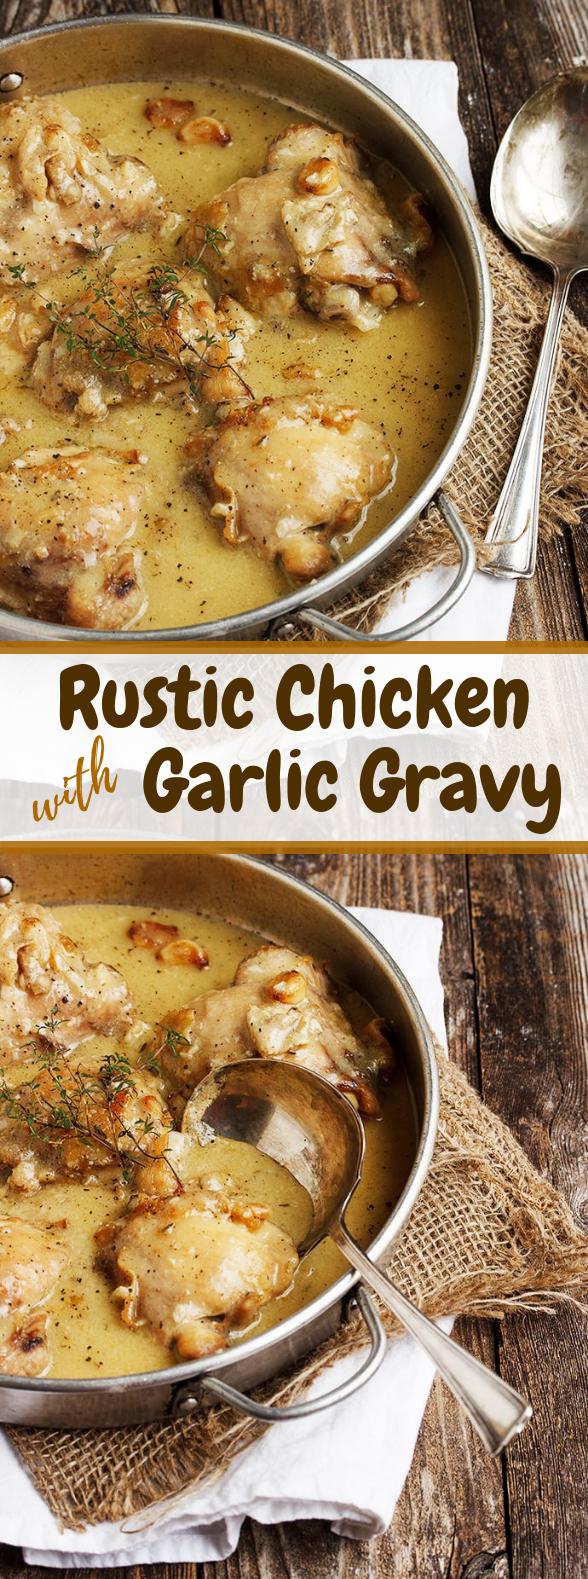 Rustic Chicken With Garlic Gravy #dinner #bestdinner